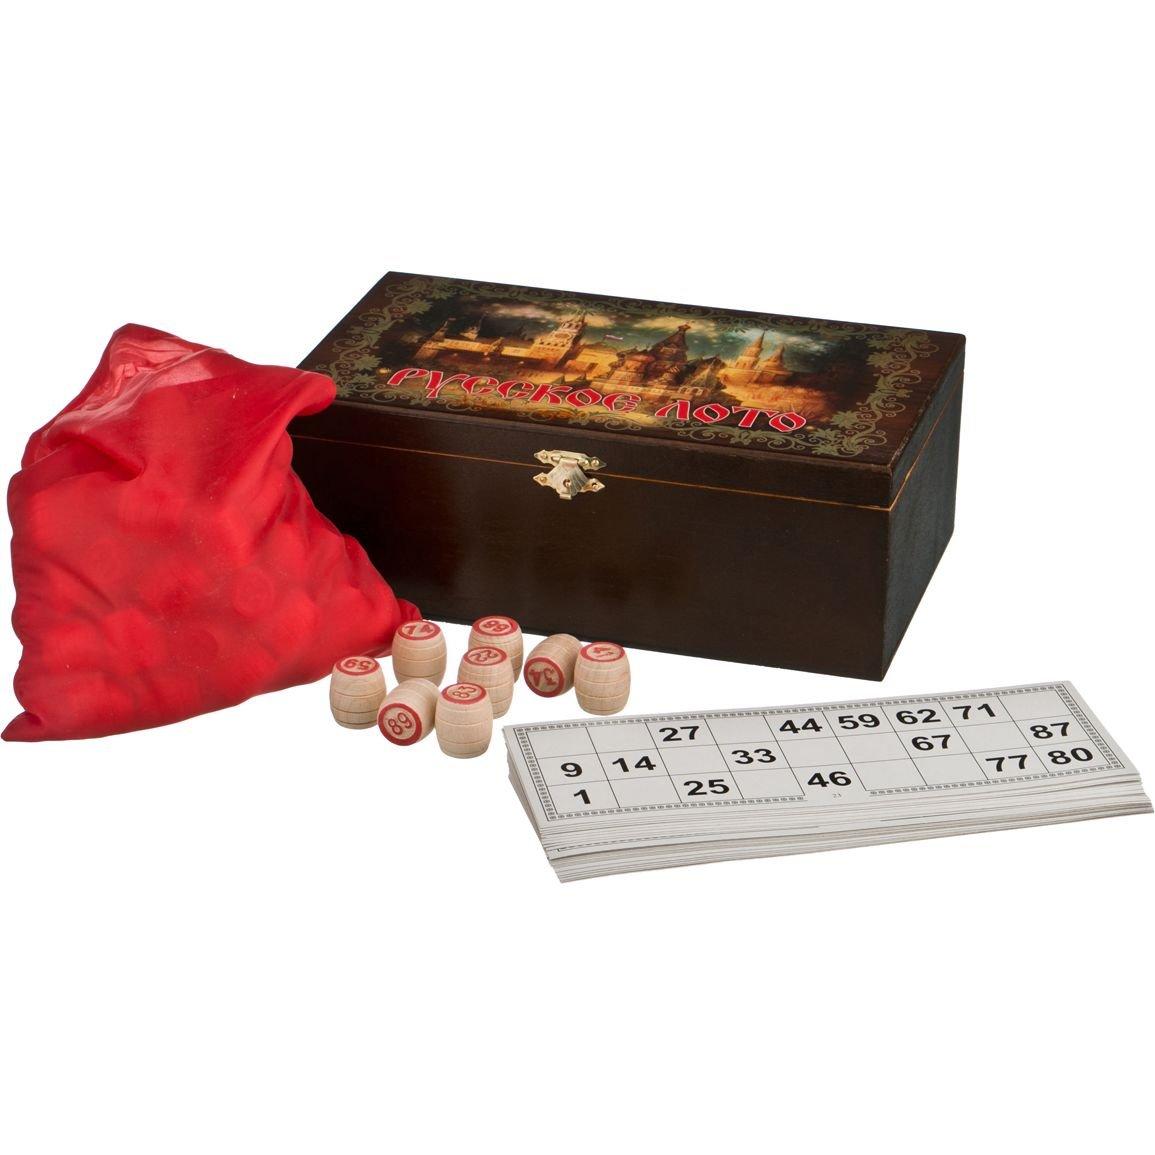 "Russian Lotto - Russian Bingo set with Wooden Barrels - in Wooden Gift Box - with '' The Night Kremlin "",26х16х10 см,28 - 318"